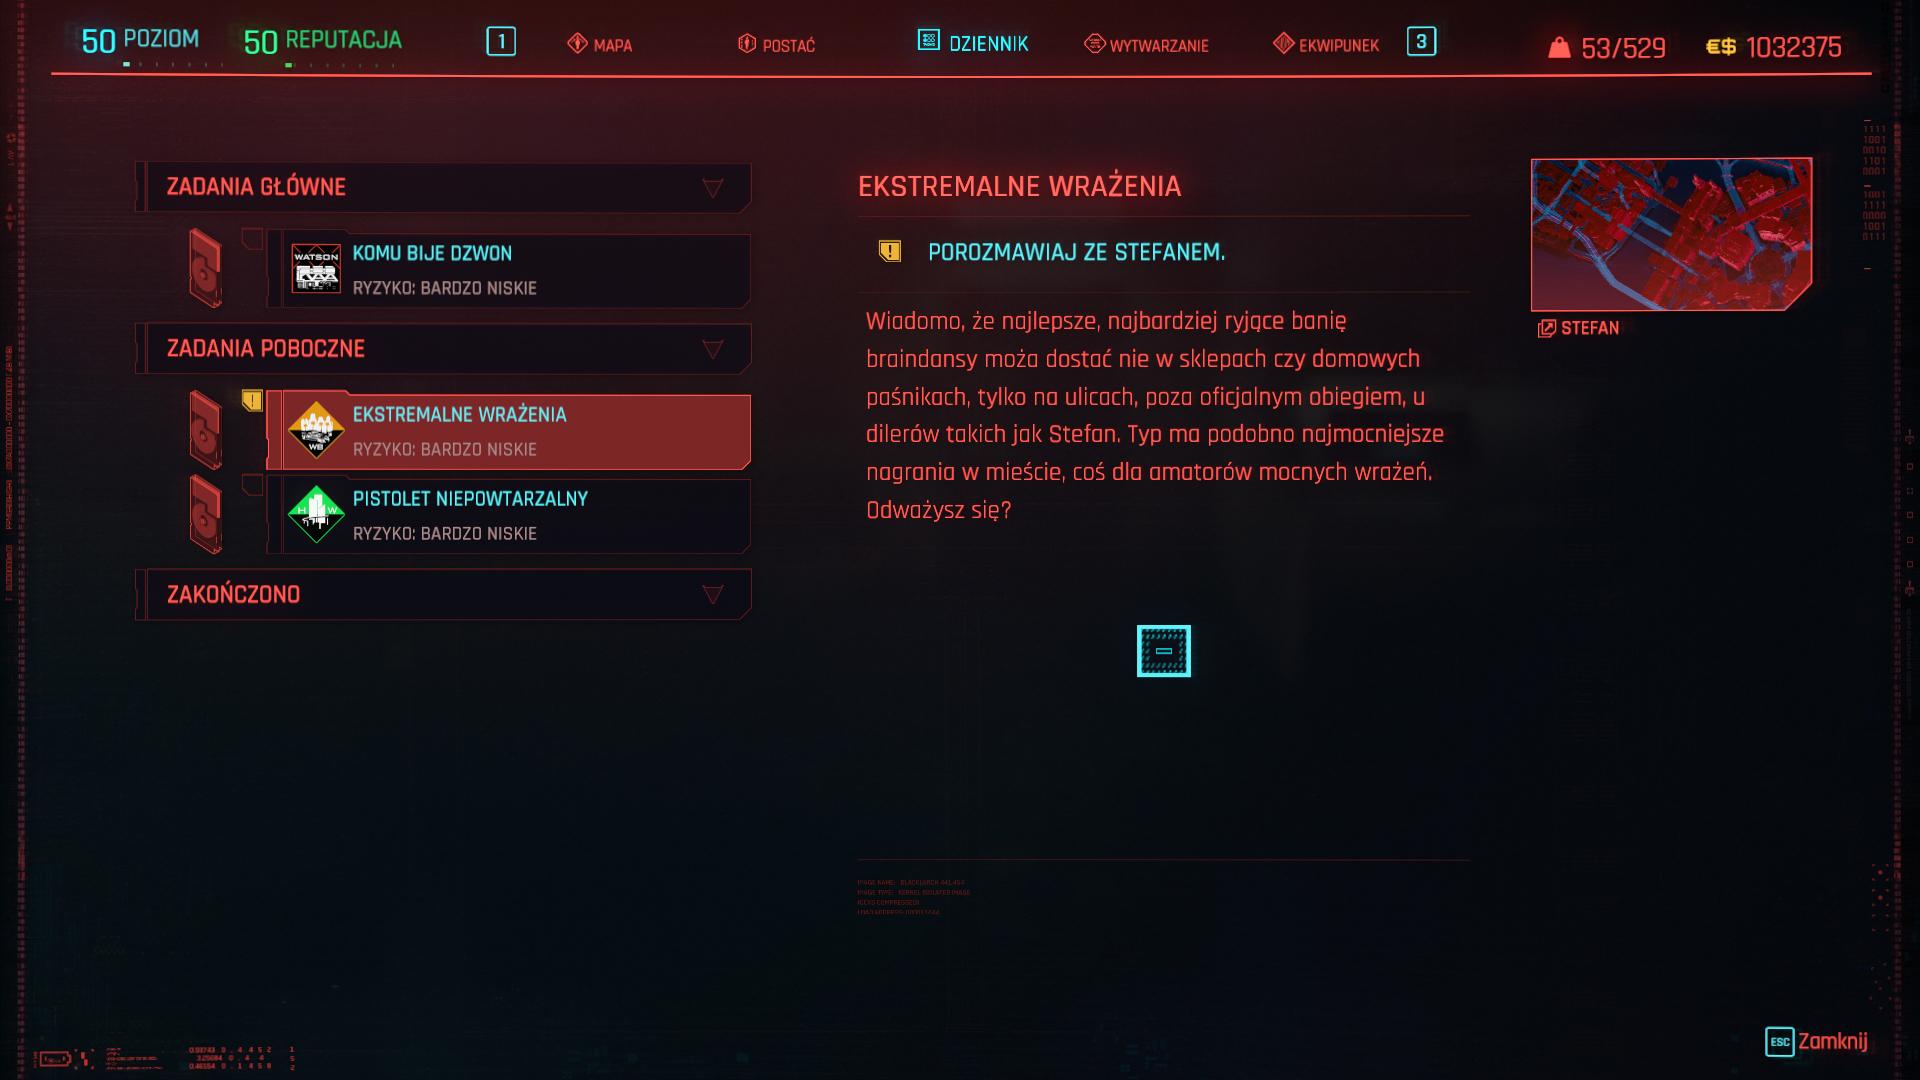 Cyberpunk 2077 (C) 2020 by CD Projekt RED 29.04.2021 16_06_30.png